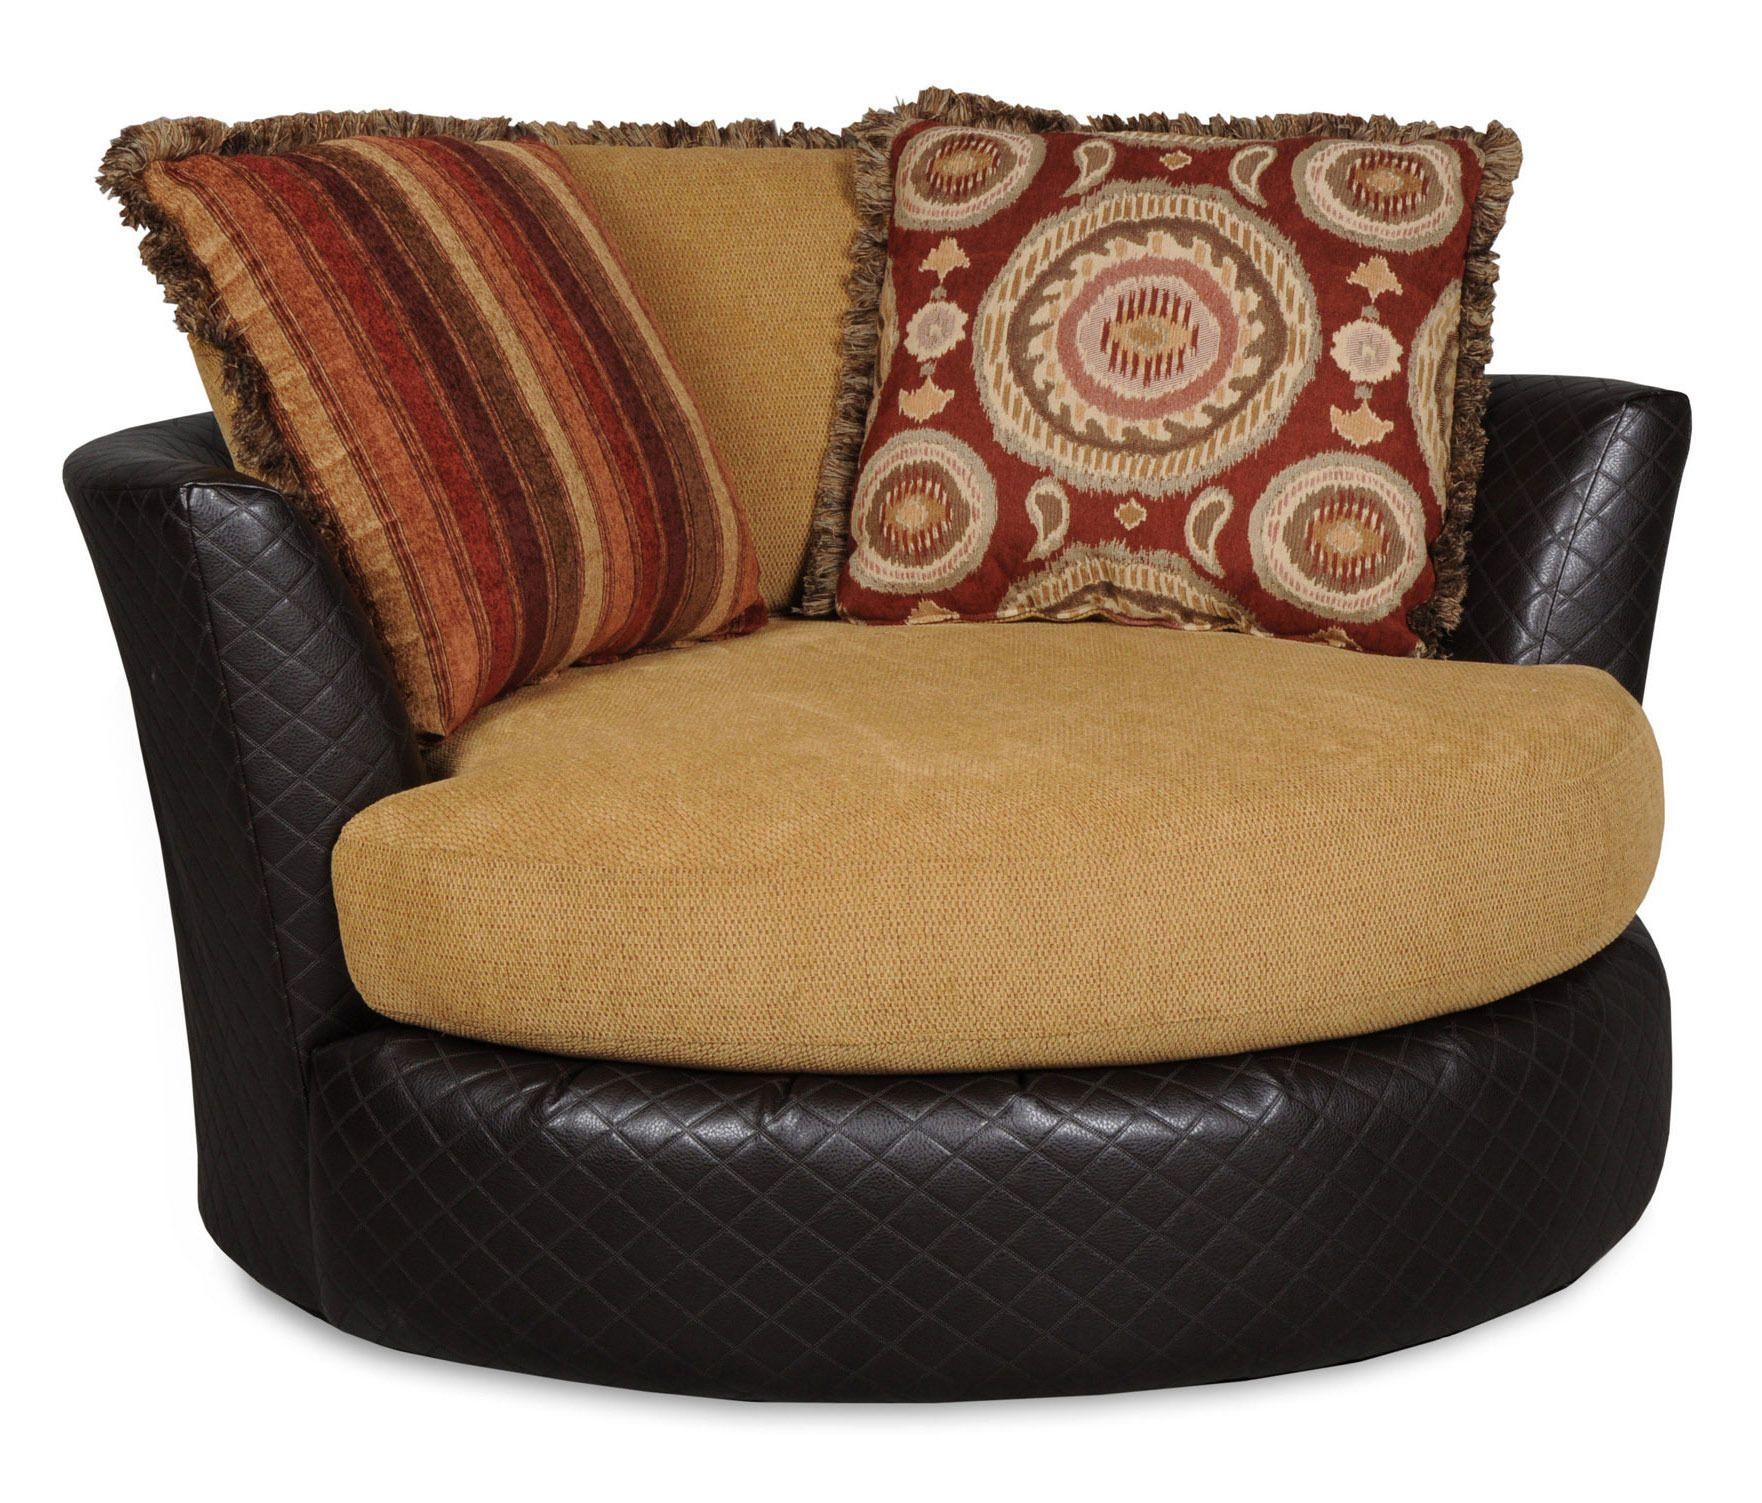 Loni Swivel Chair Chelsea Home Furniture